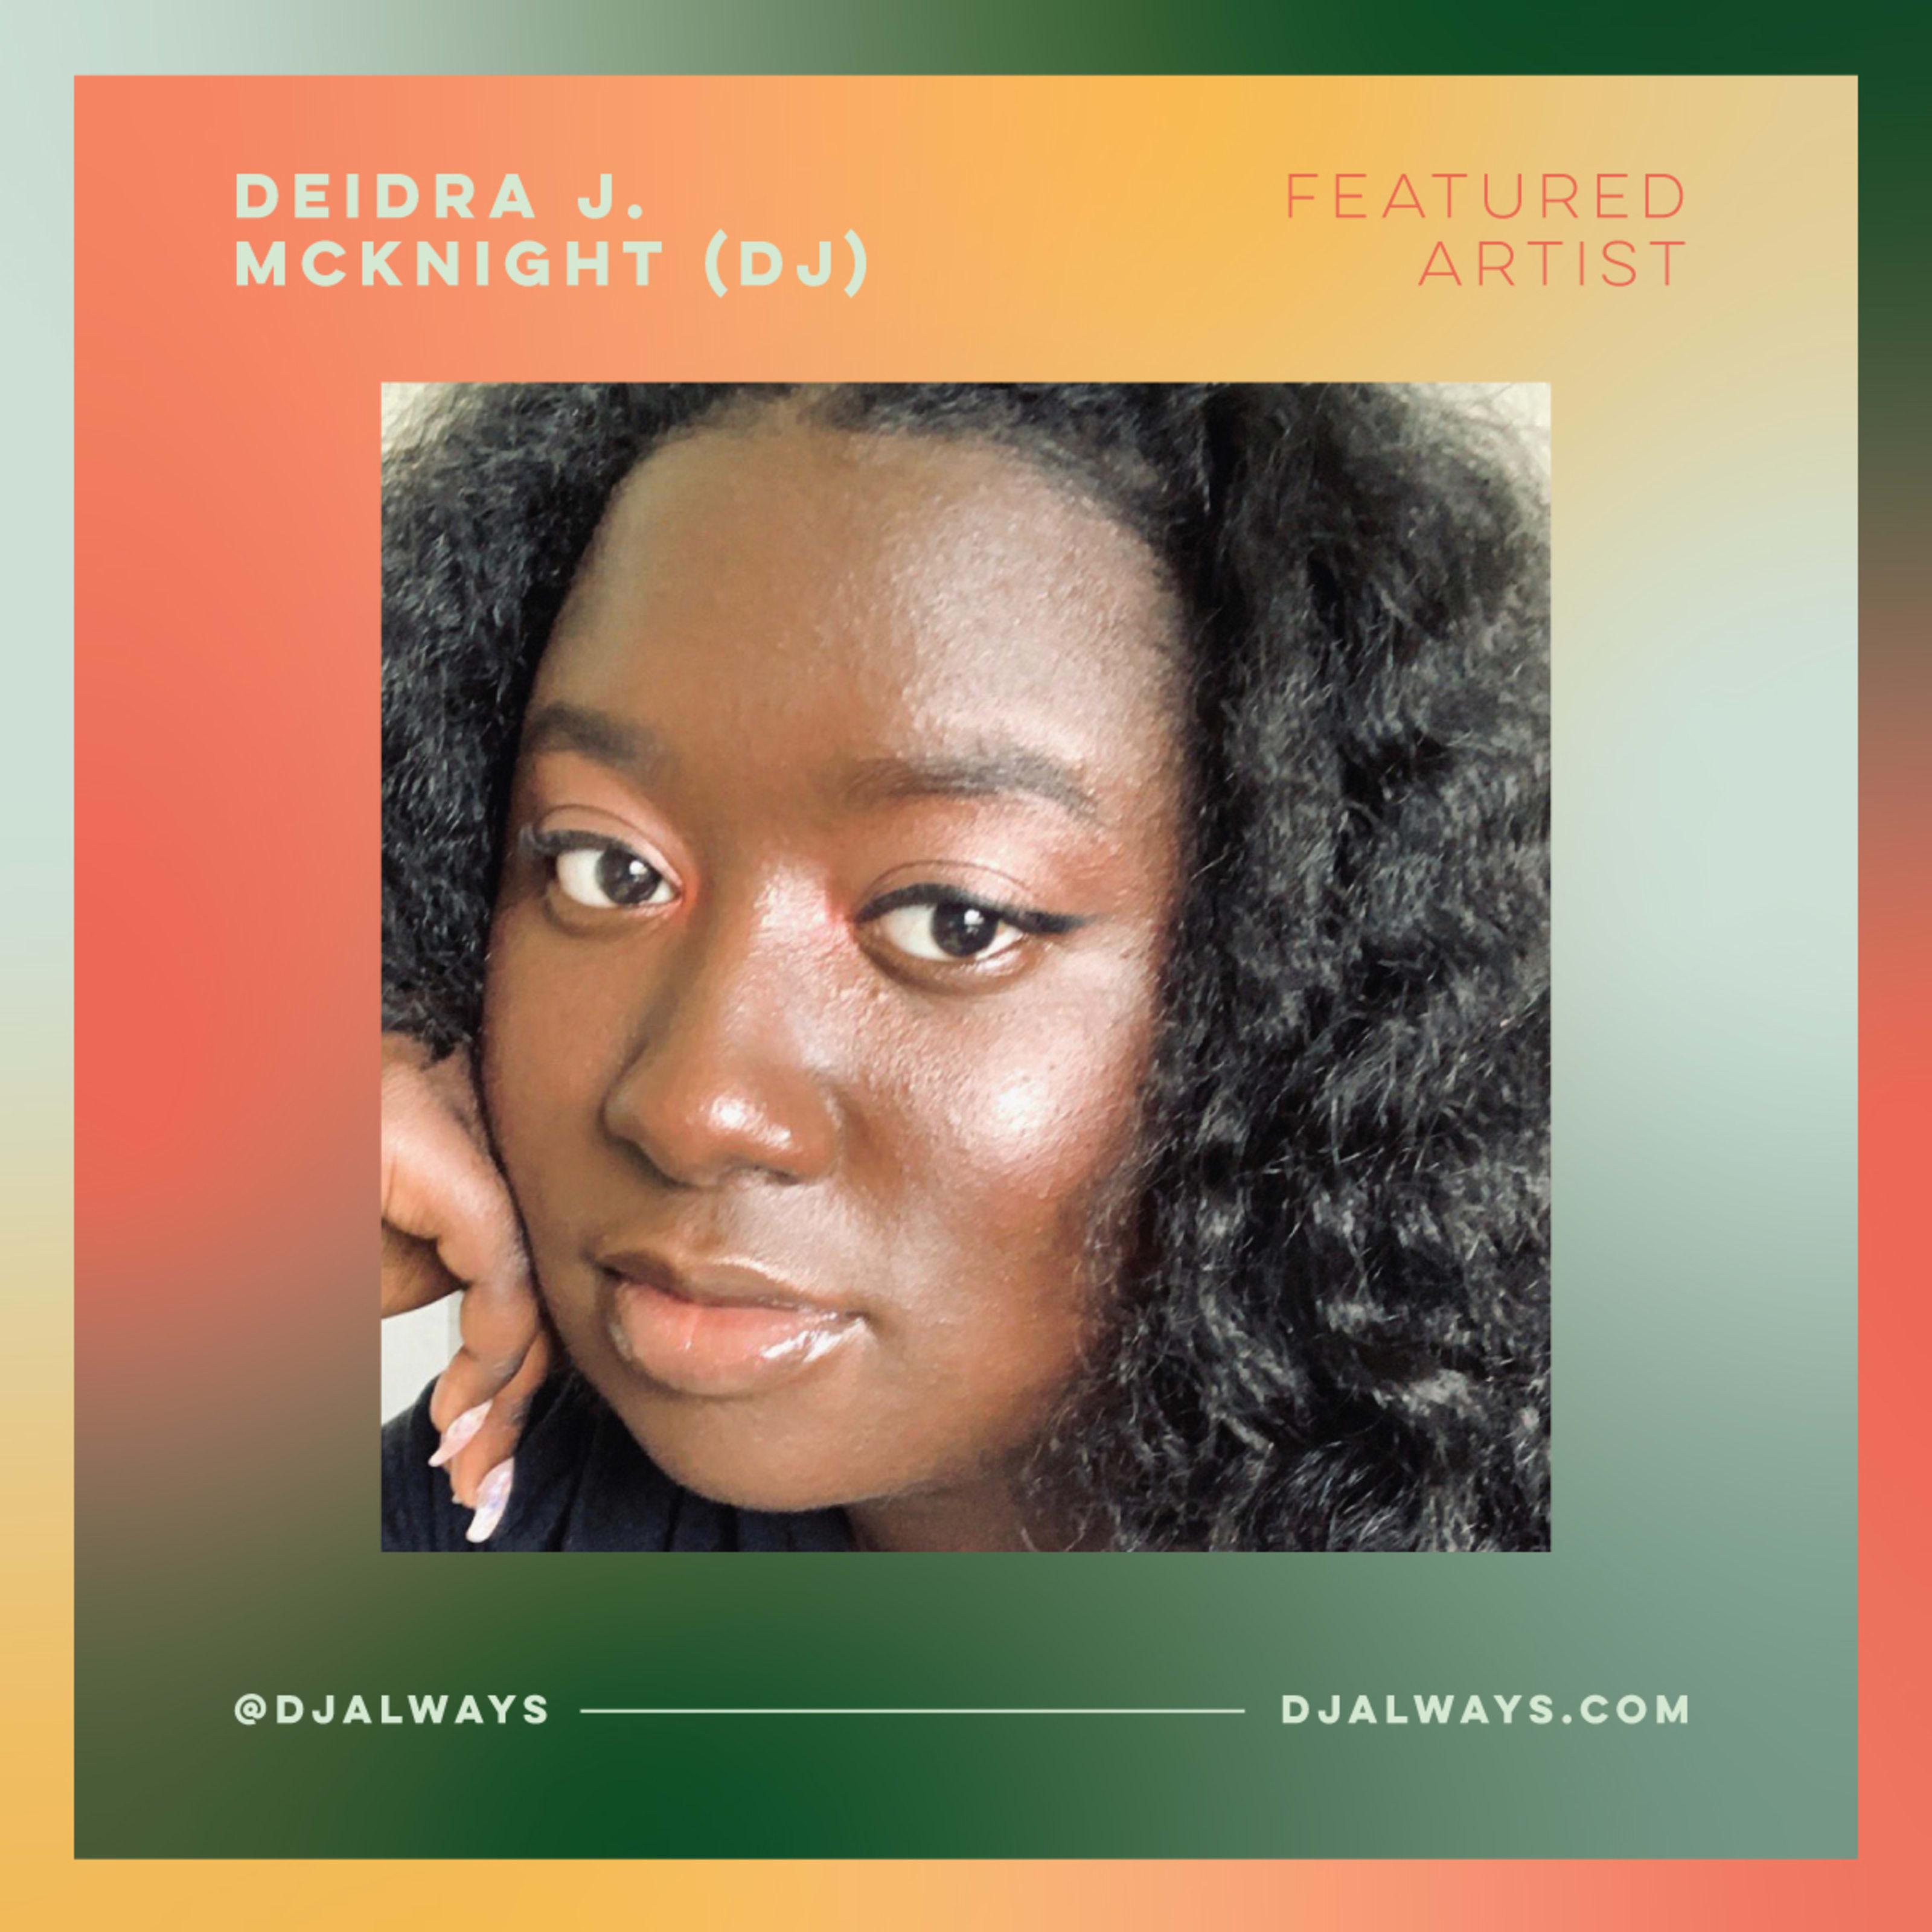 Featured Artist Deidra McKnight (DJ)